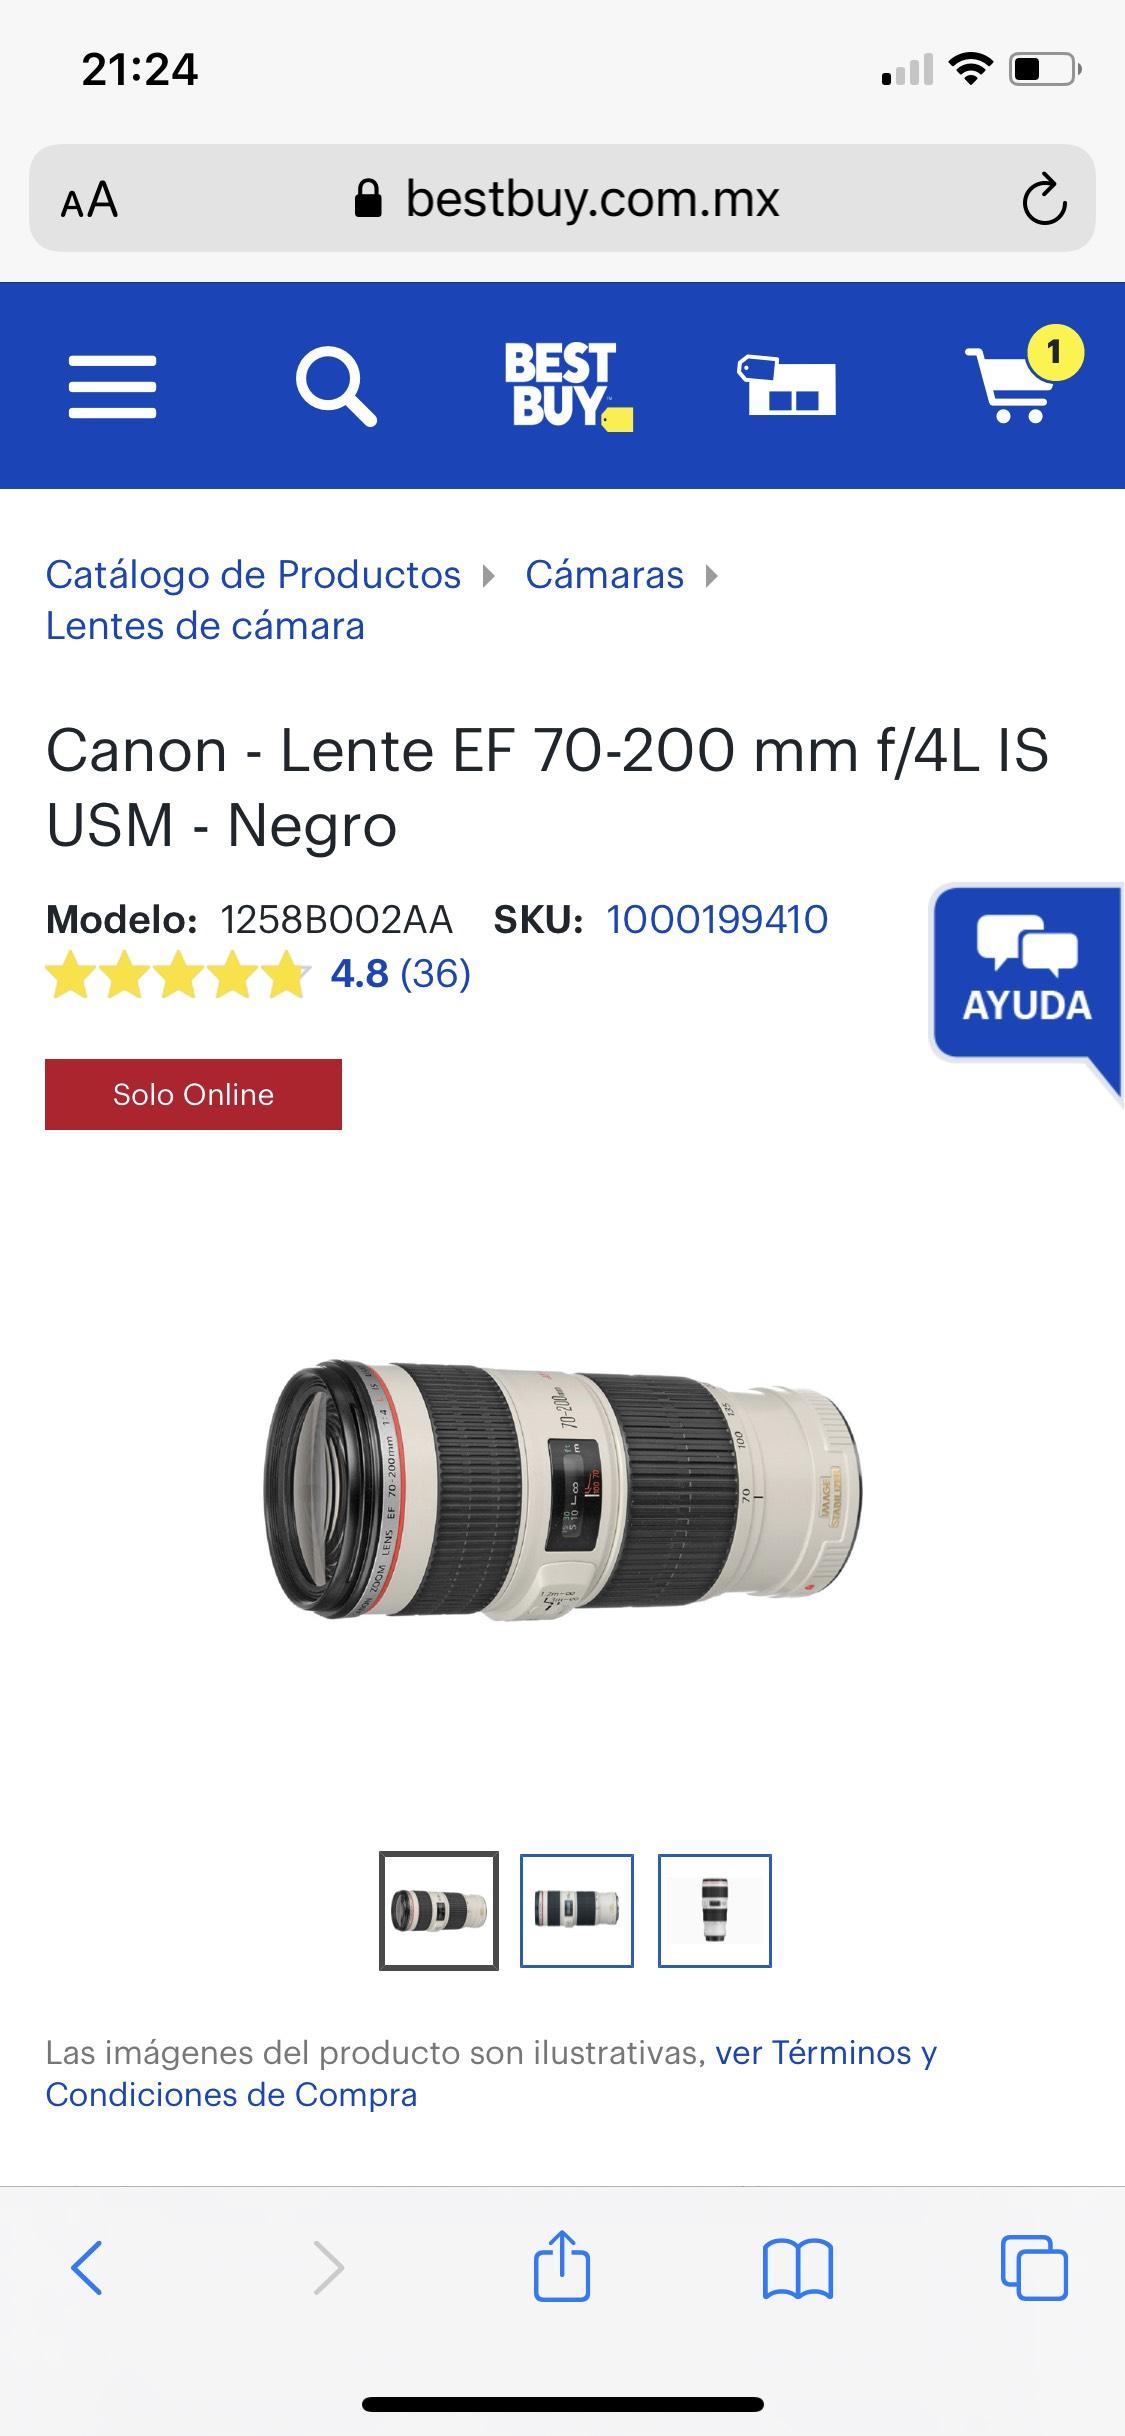 Best Buy: Lente canon descuentaso